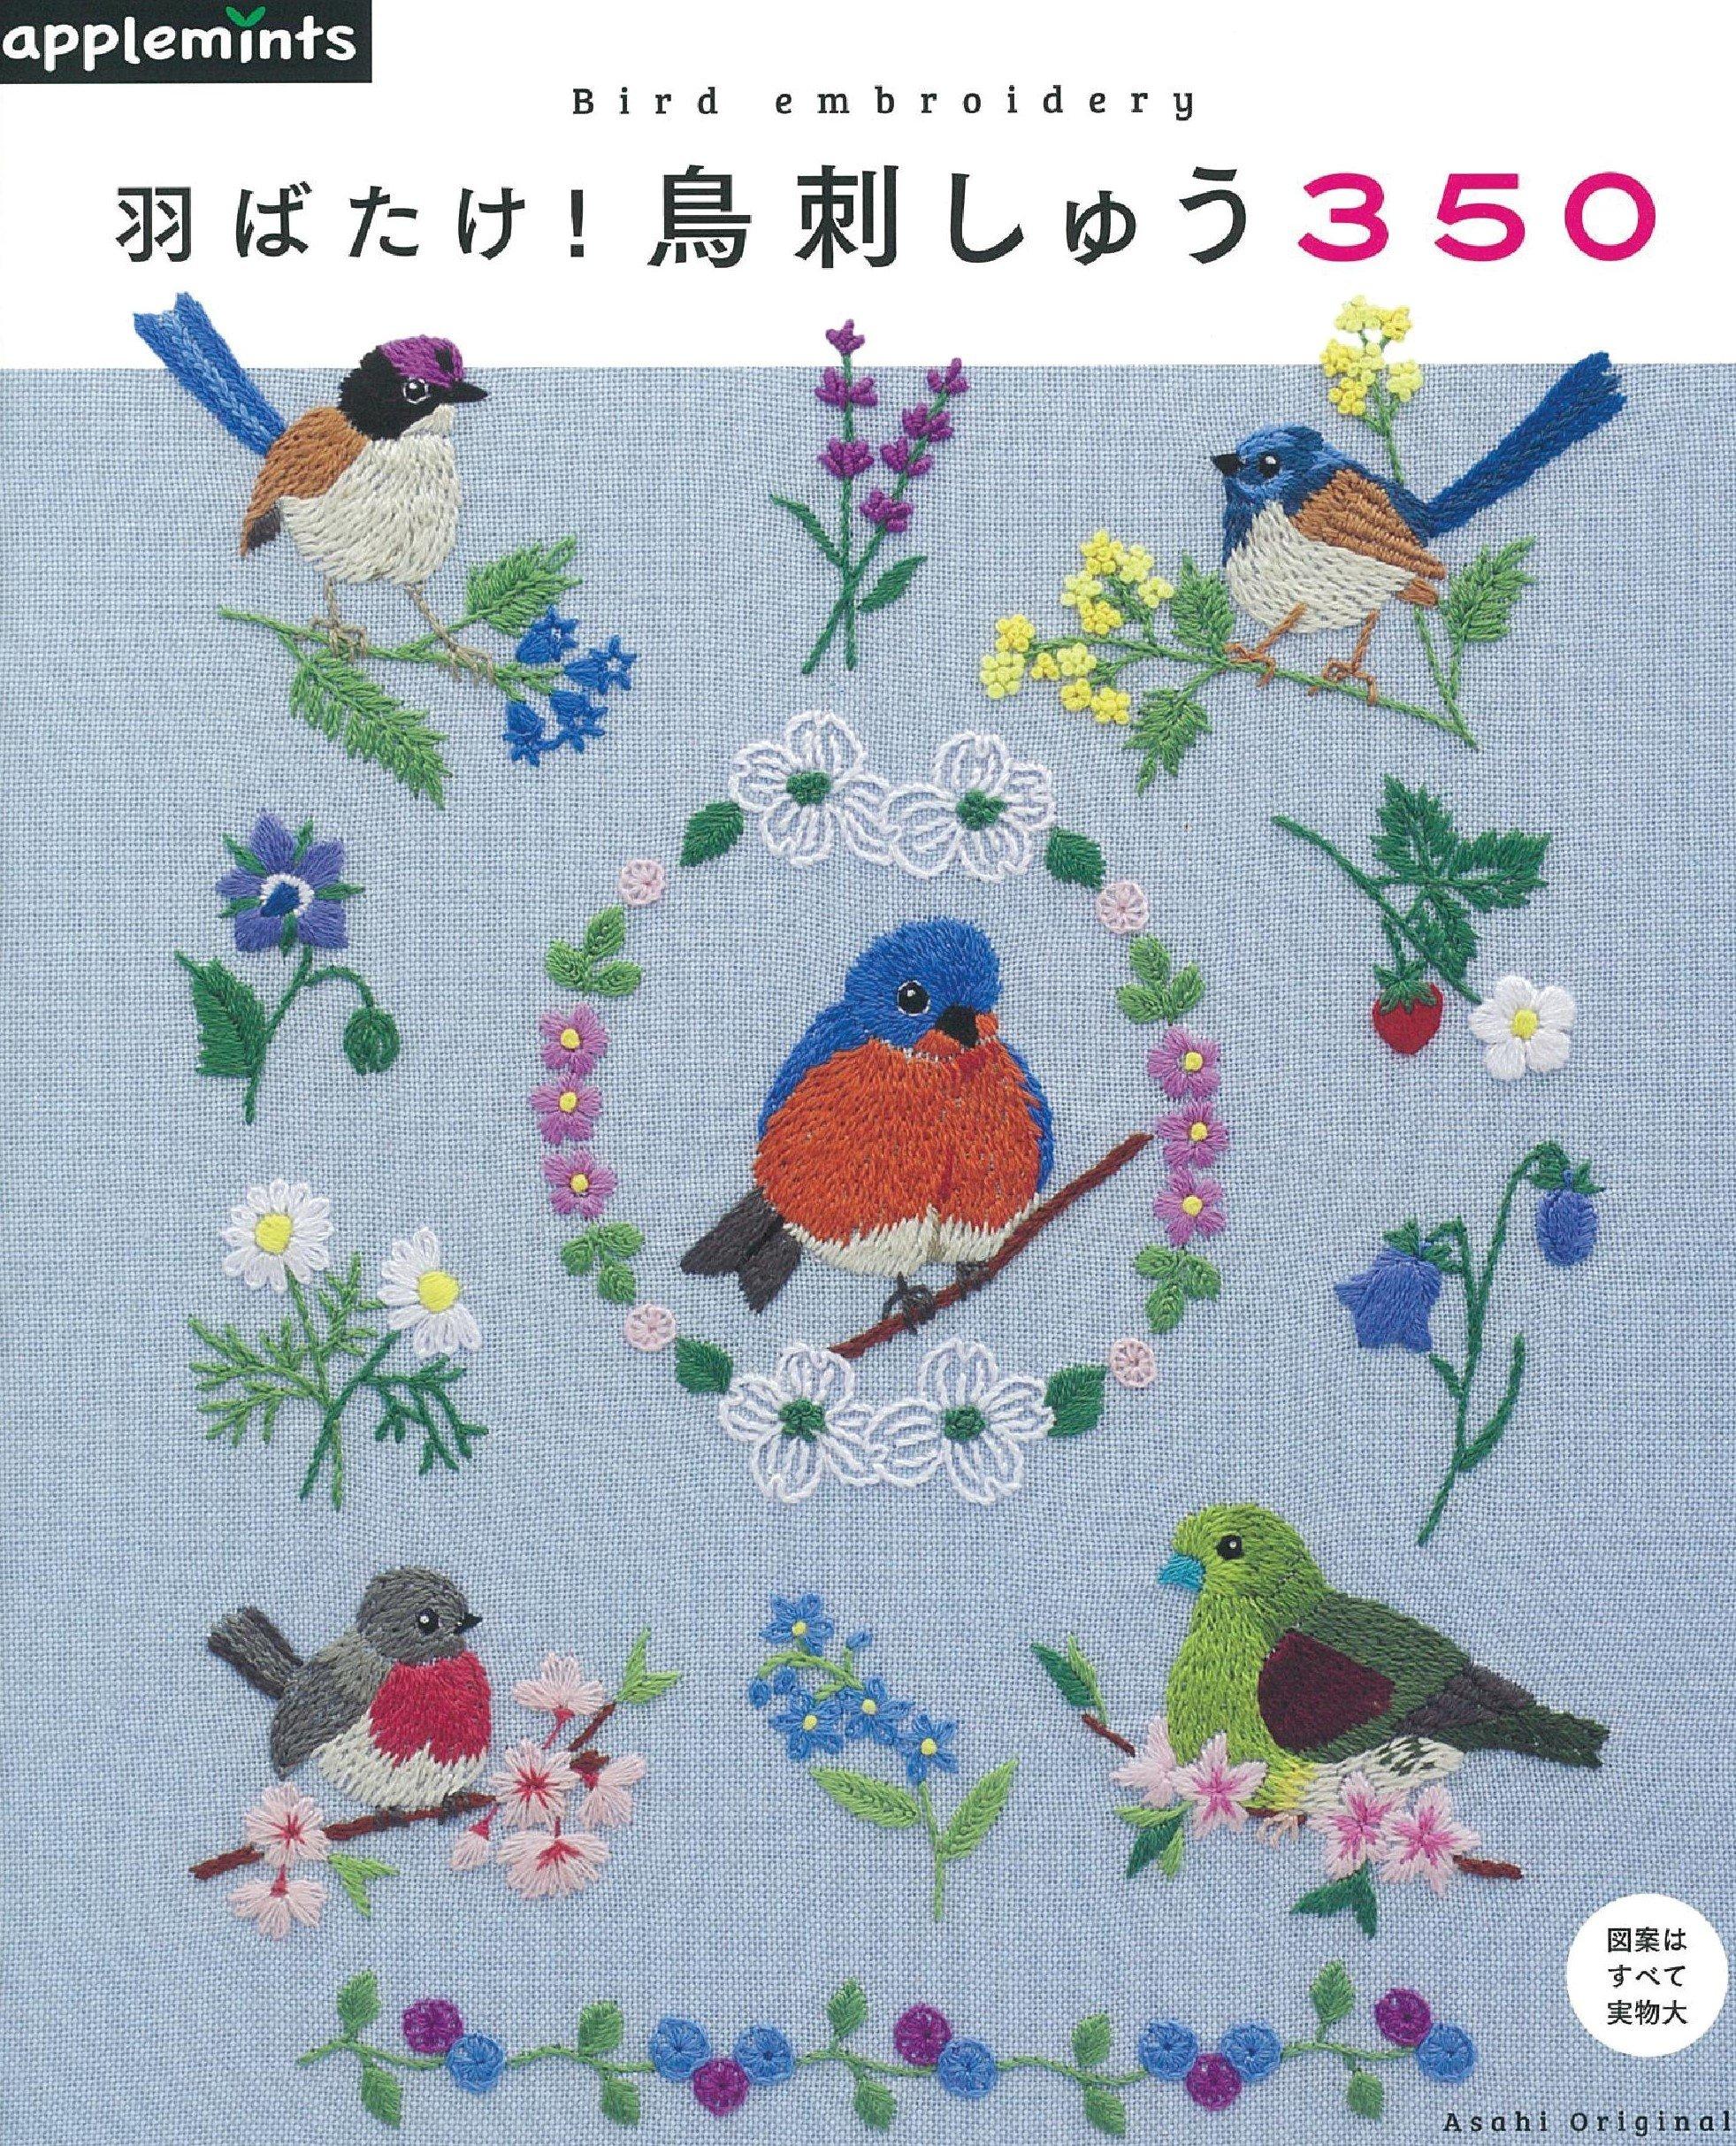 Habatake bird embroidery 350